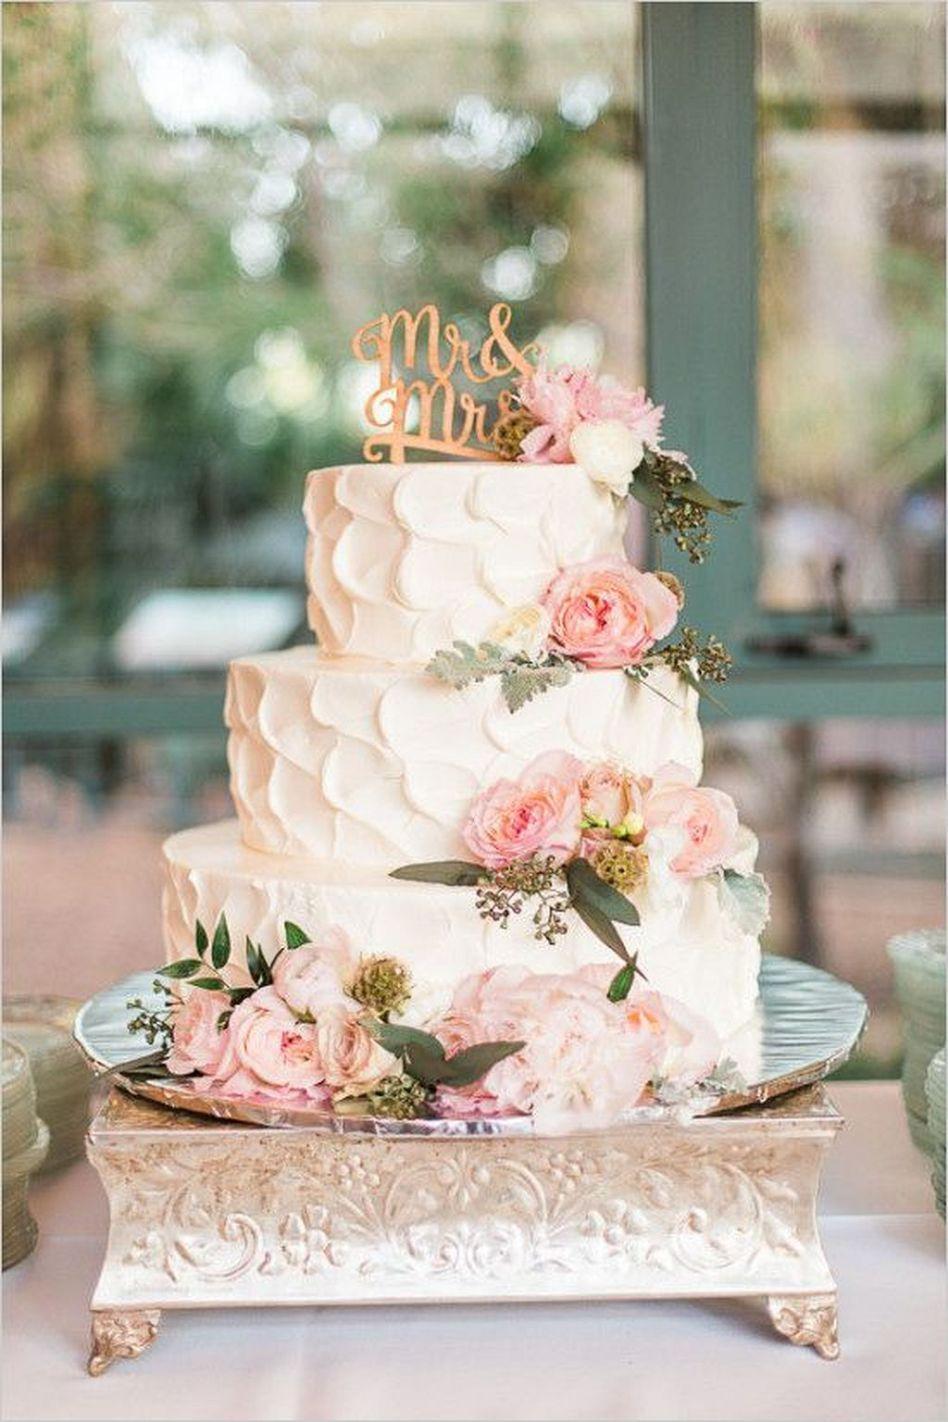 60 Simple And Elegant Wedding Cake Ideas 55